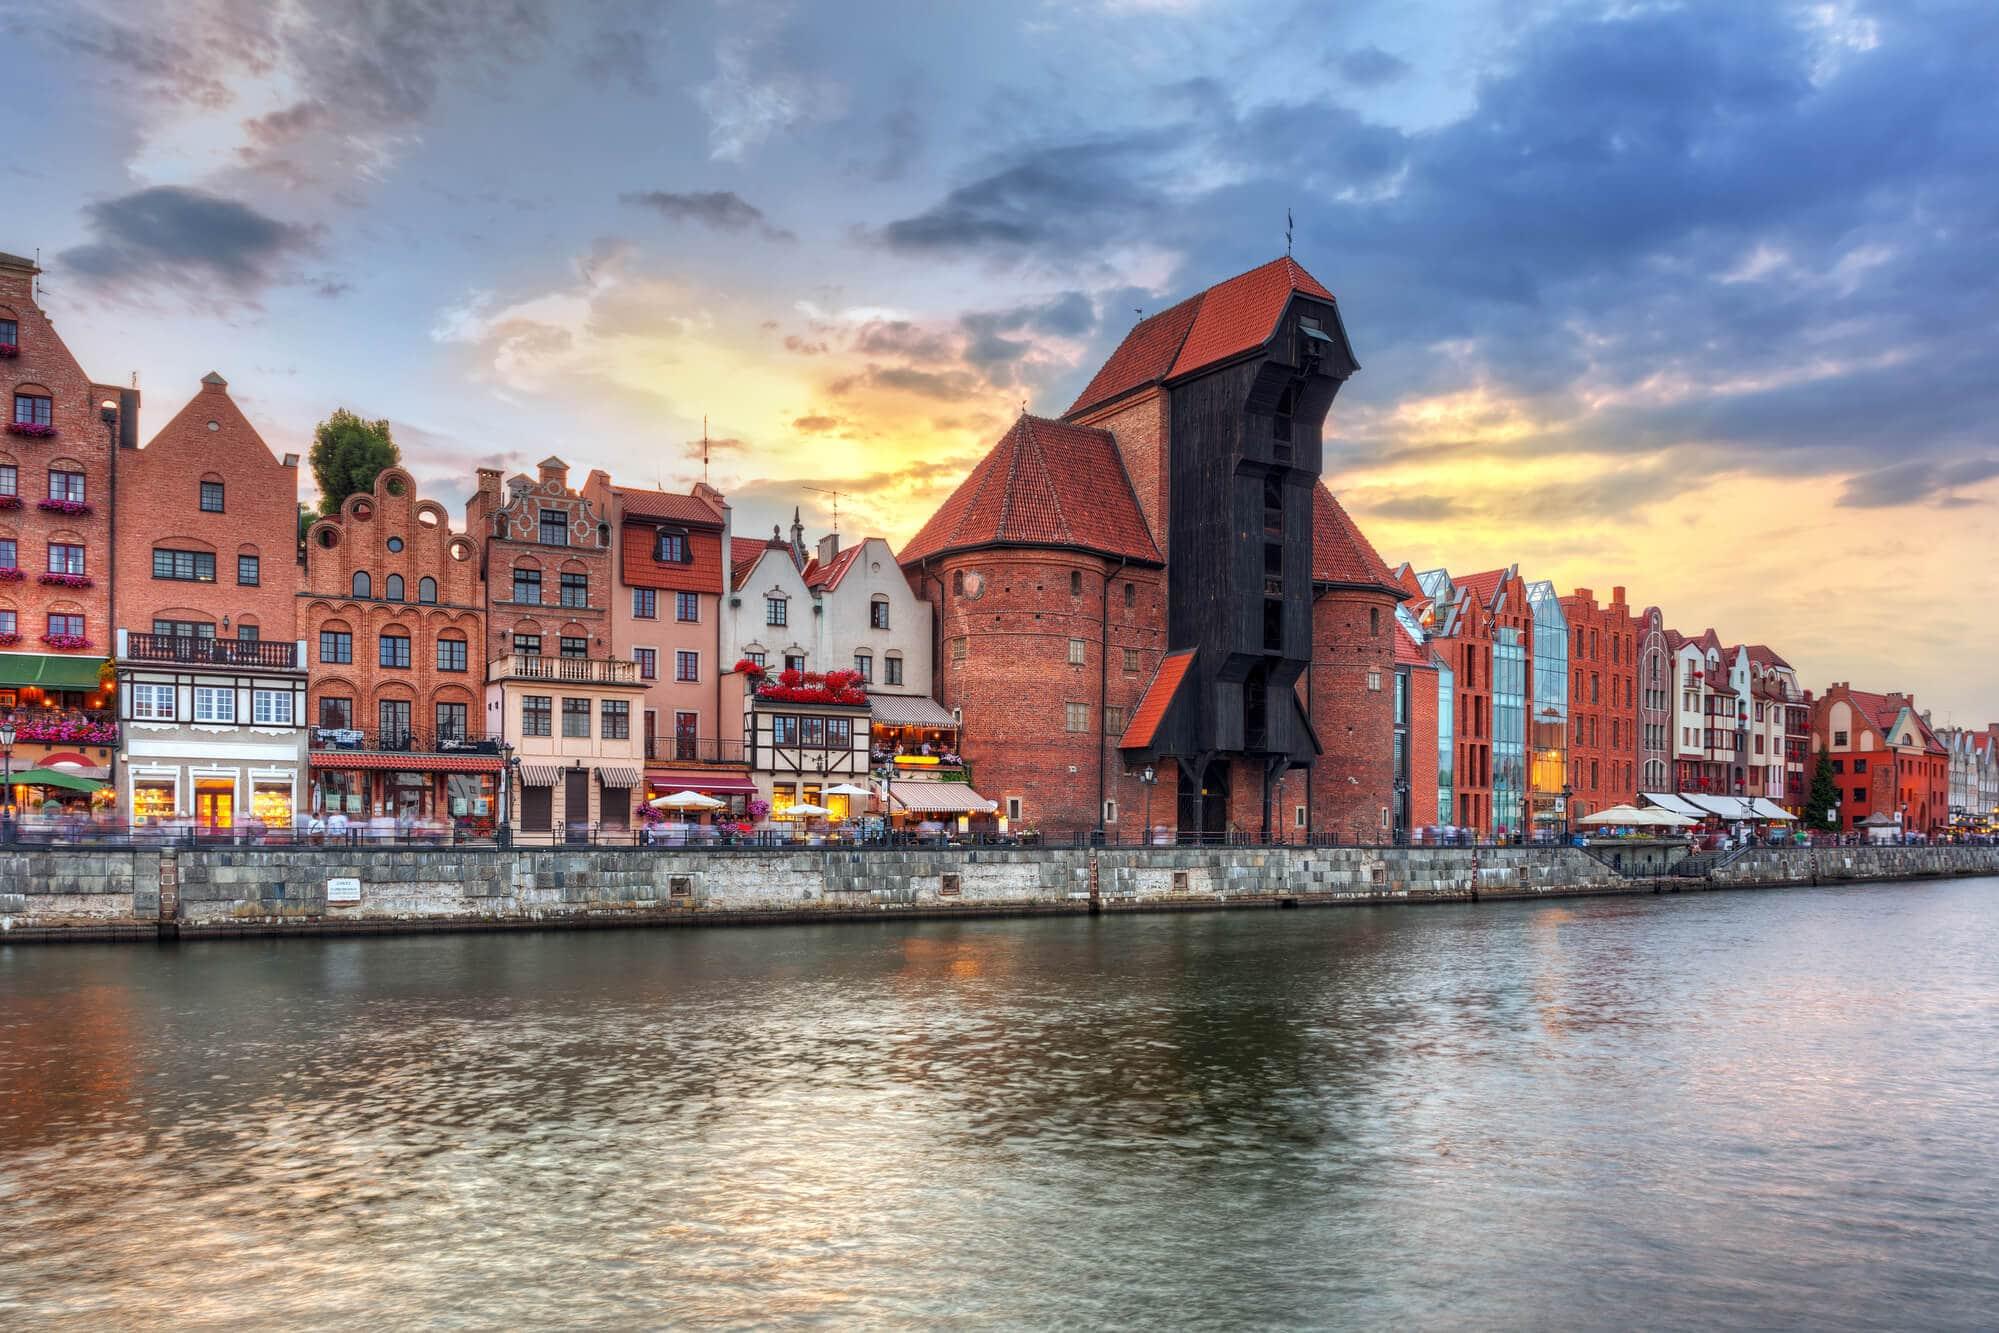 2 days in Gdansk, Poland - View Motlawa River, Gdansk Waterfront and Zuraw crane